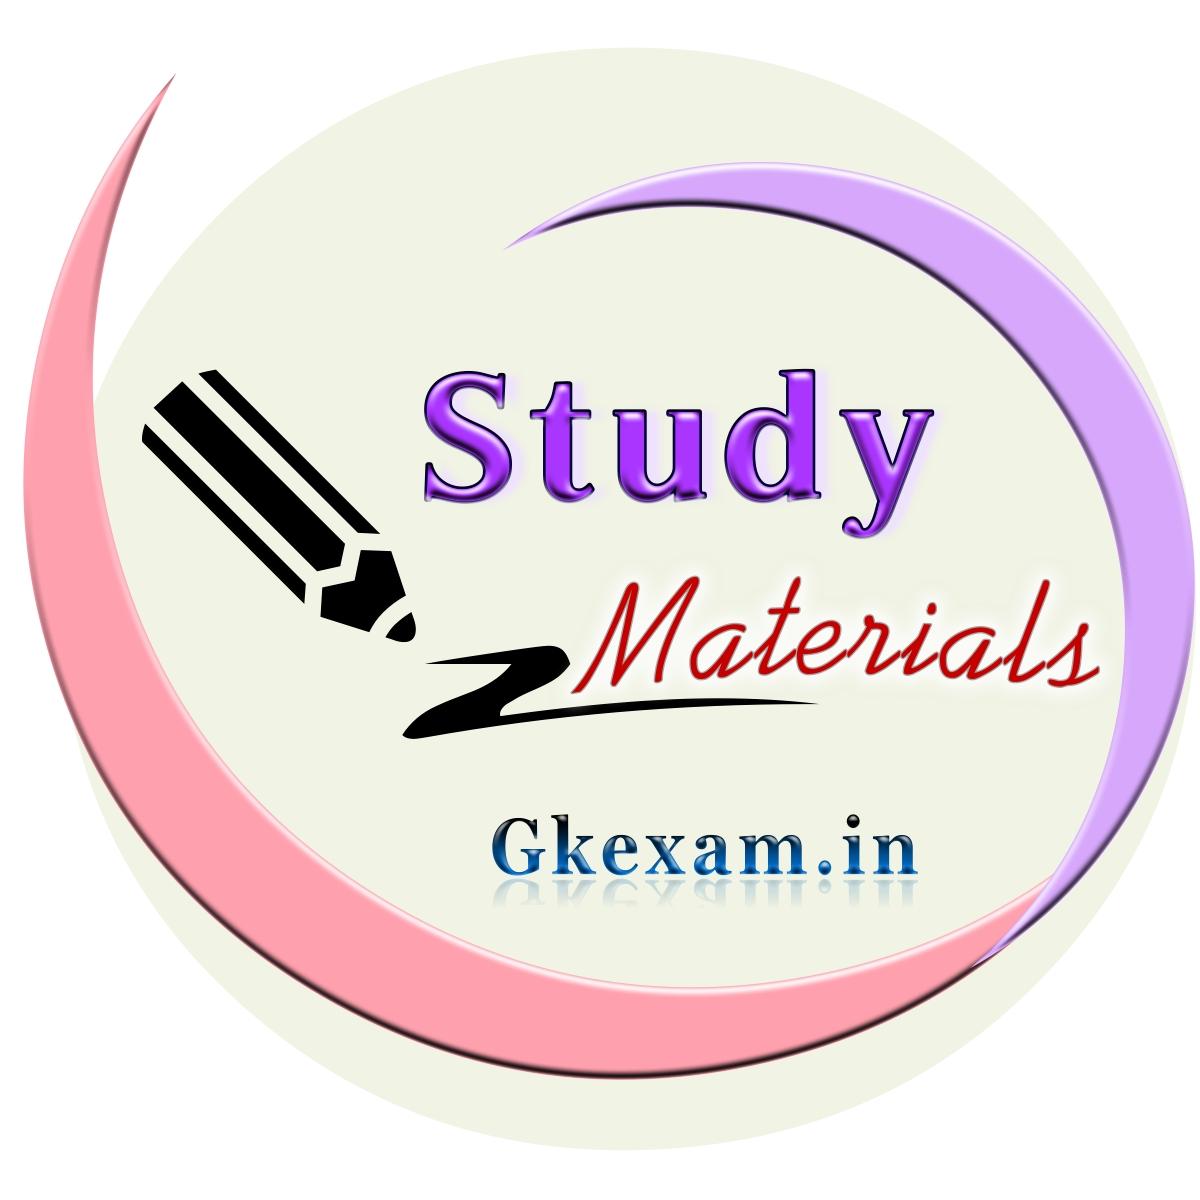 Std 6 Study Materials